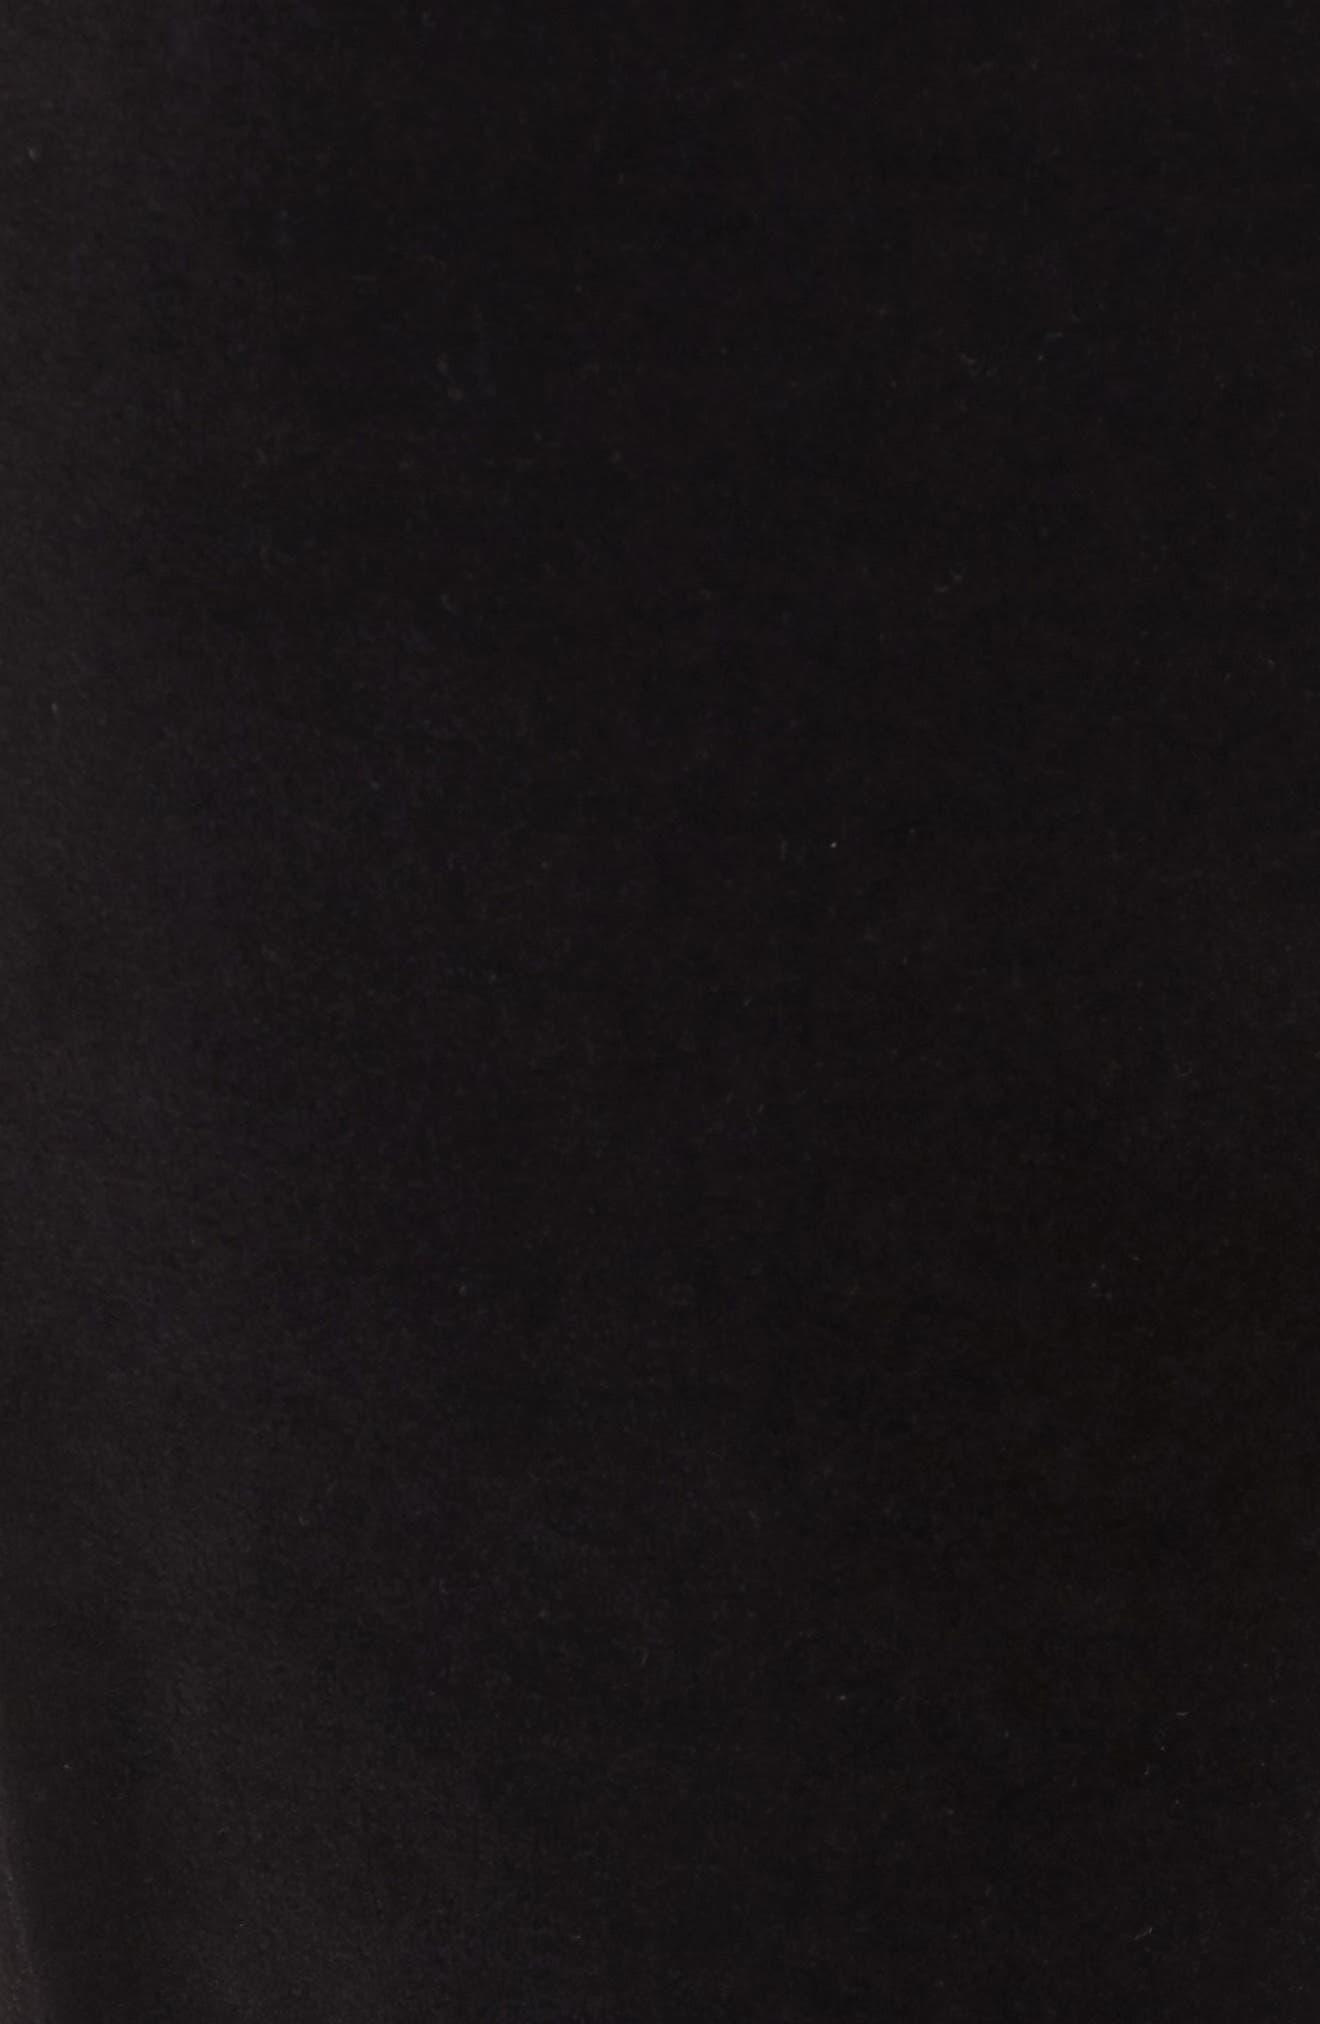 Zuma Velour Track Pants,                             Alternate thumbnail 5, color,                             Pitch Black